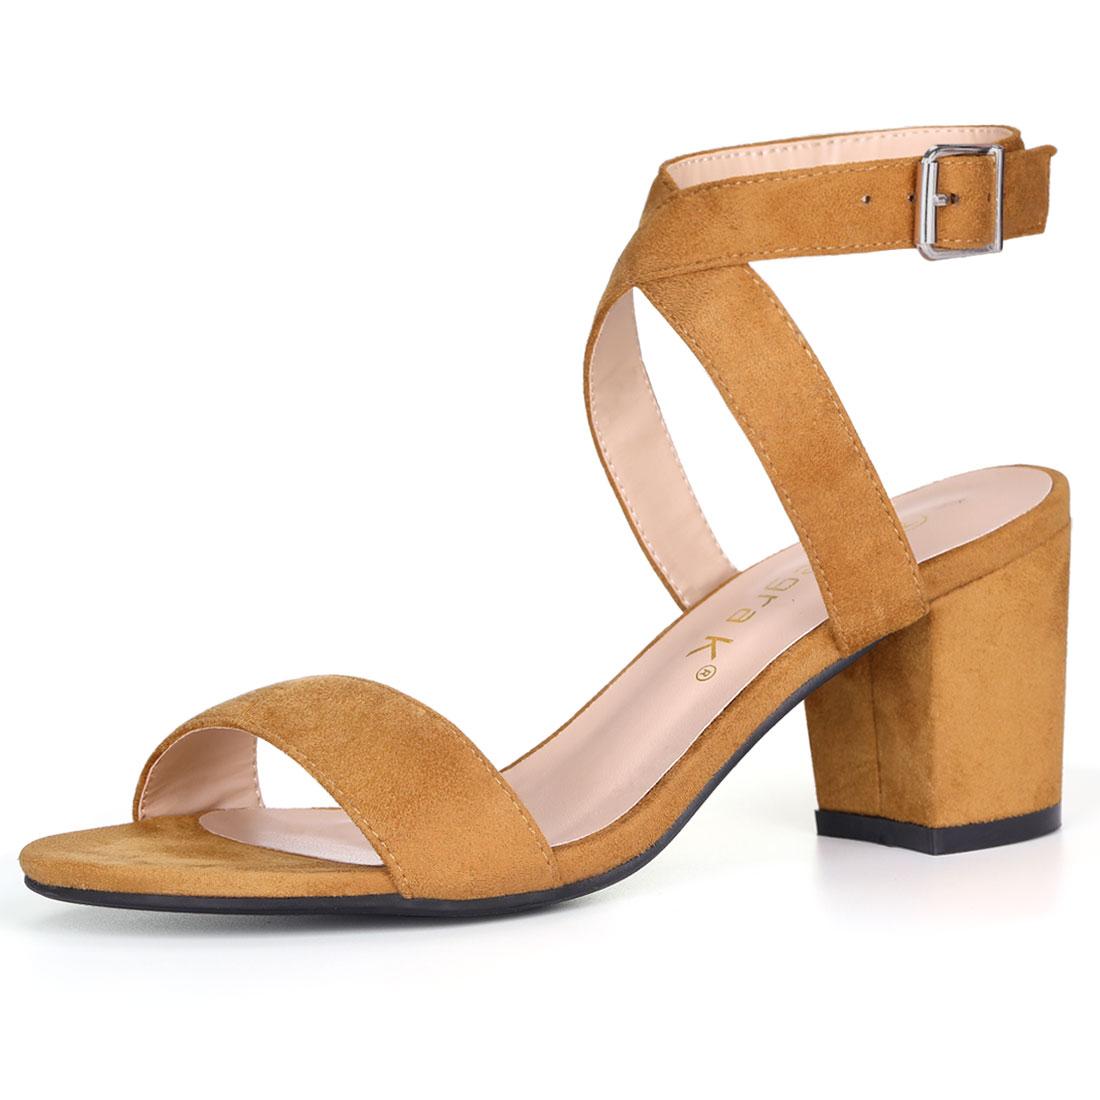 Allegra K Women's Crisscross Mid Block Heel Ankle Strap Sandals Brown US 5